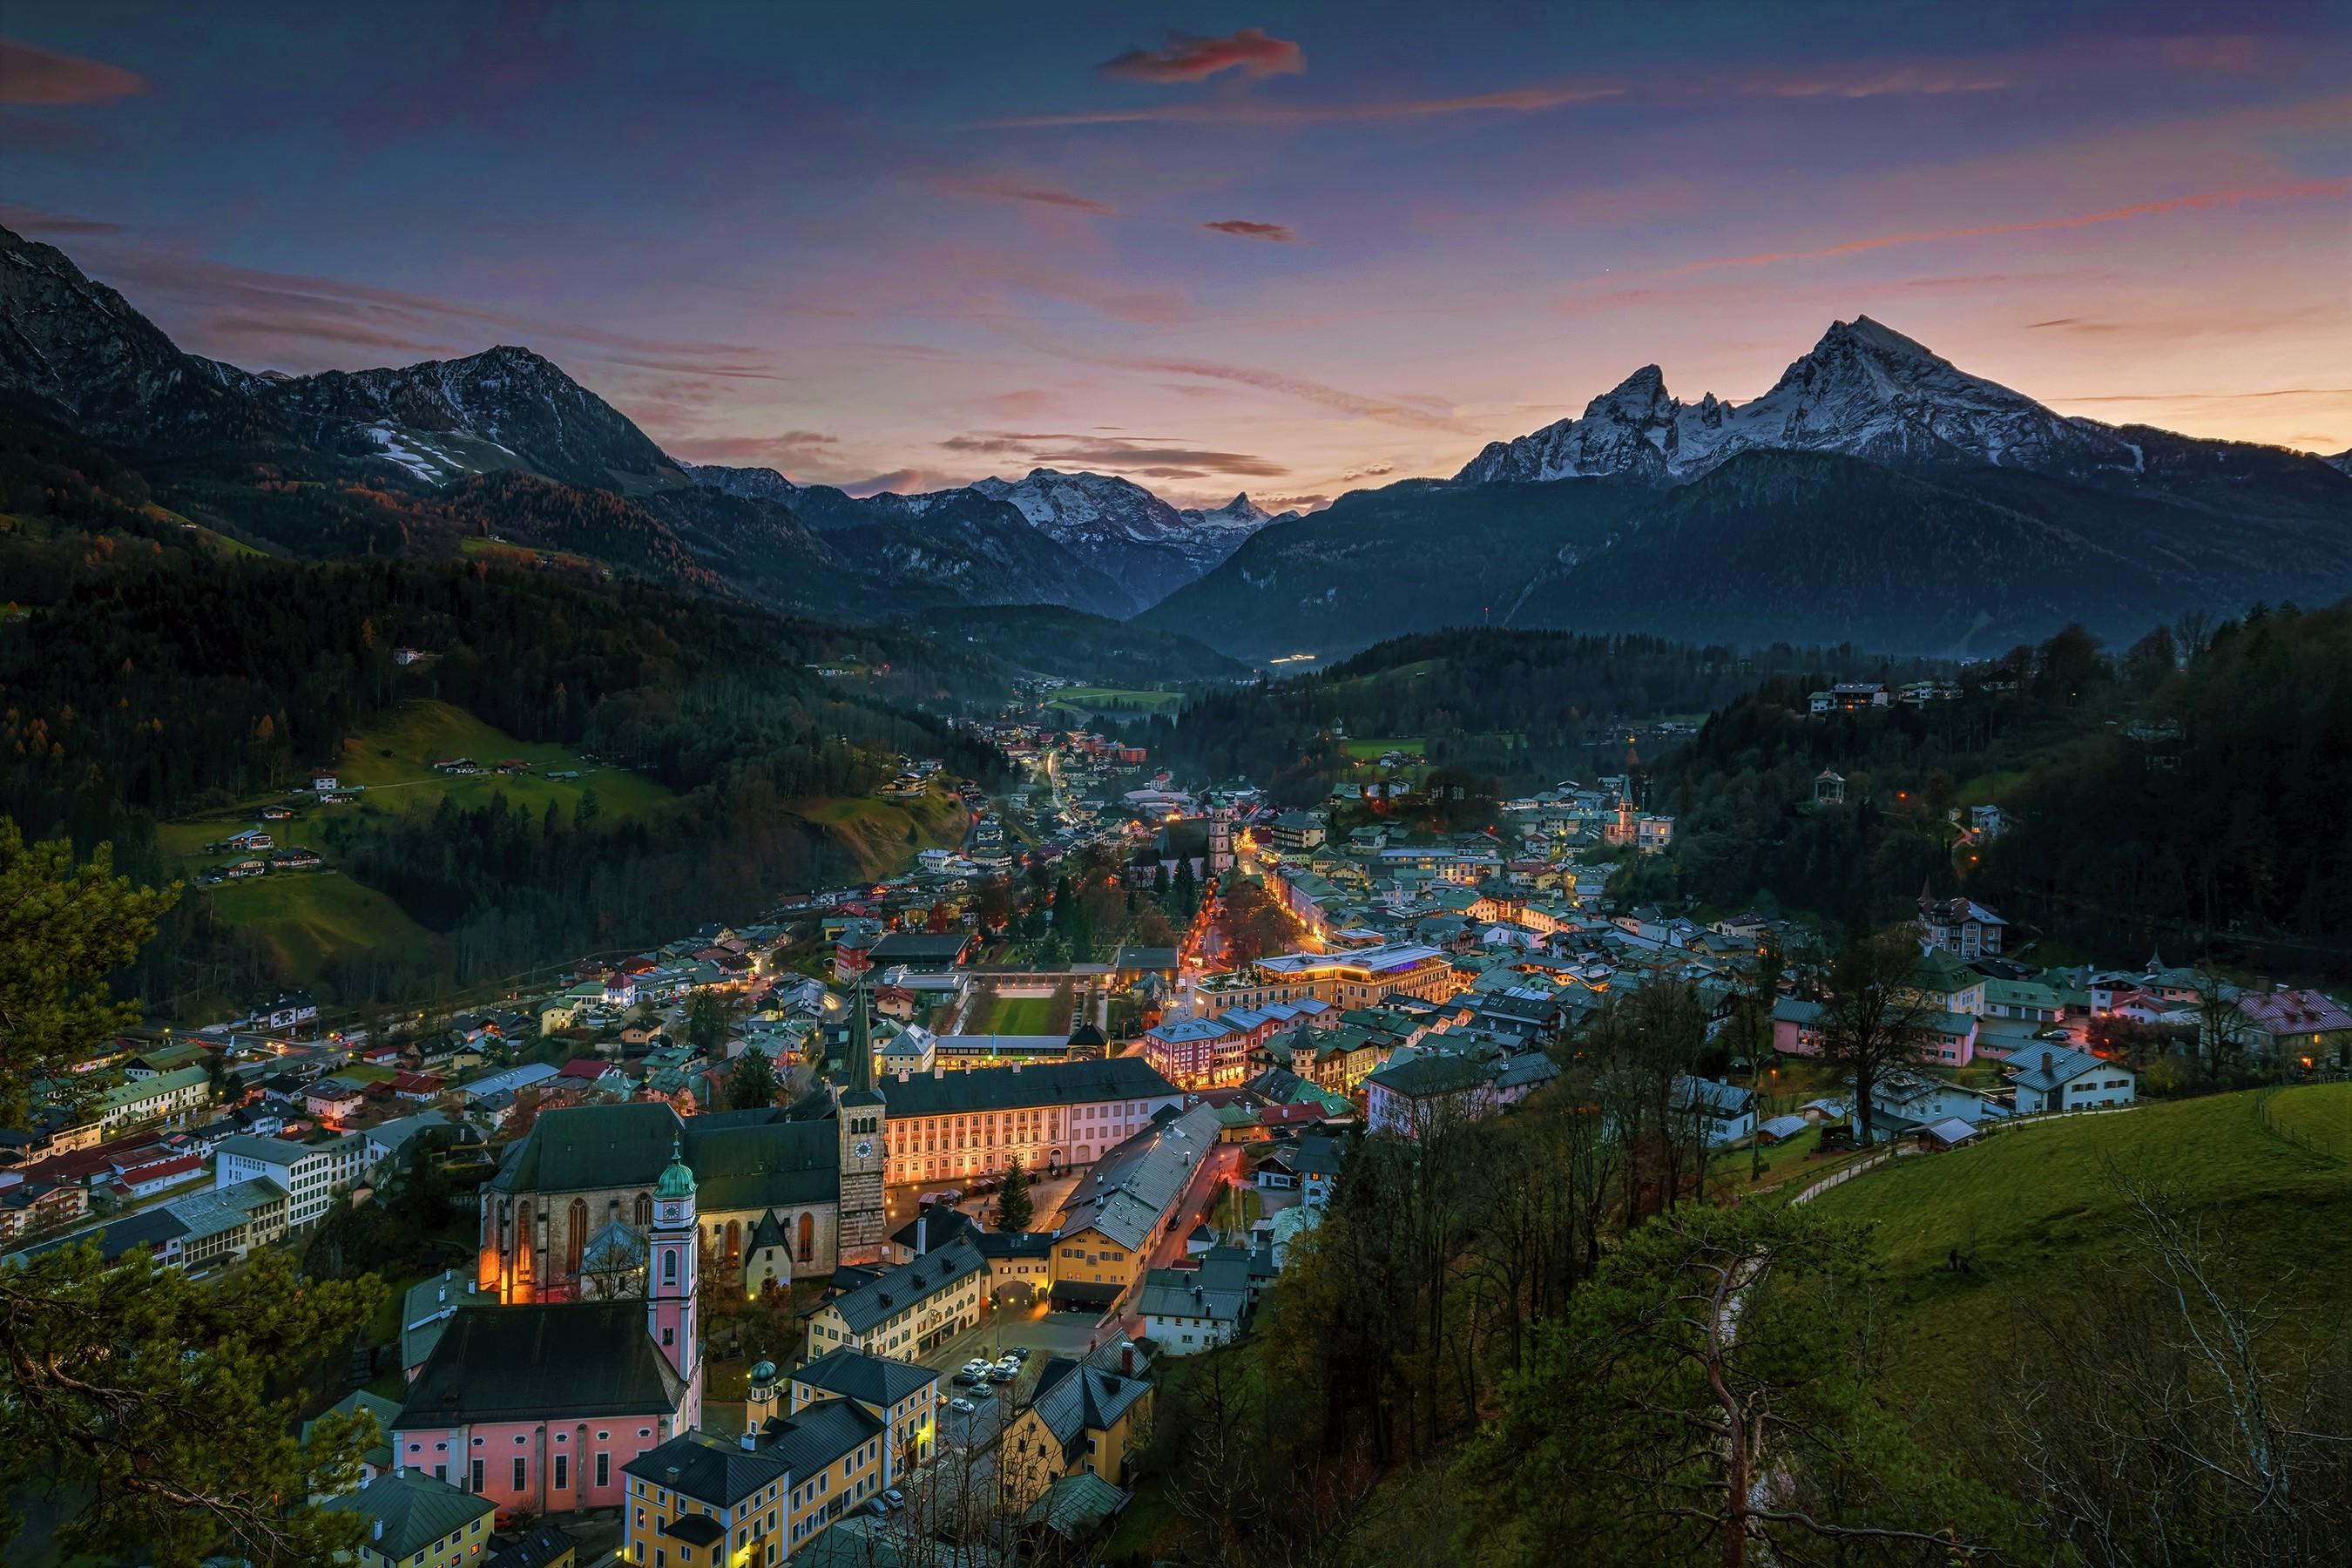 Bavaria Germany Mountain Forest Valley Dusk Twilight Night Light 2700x1800